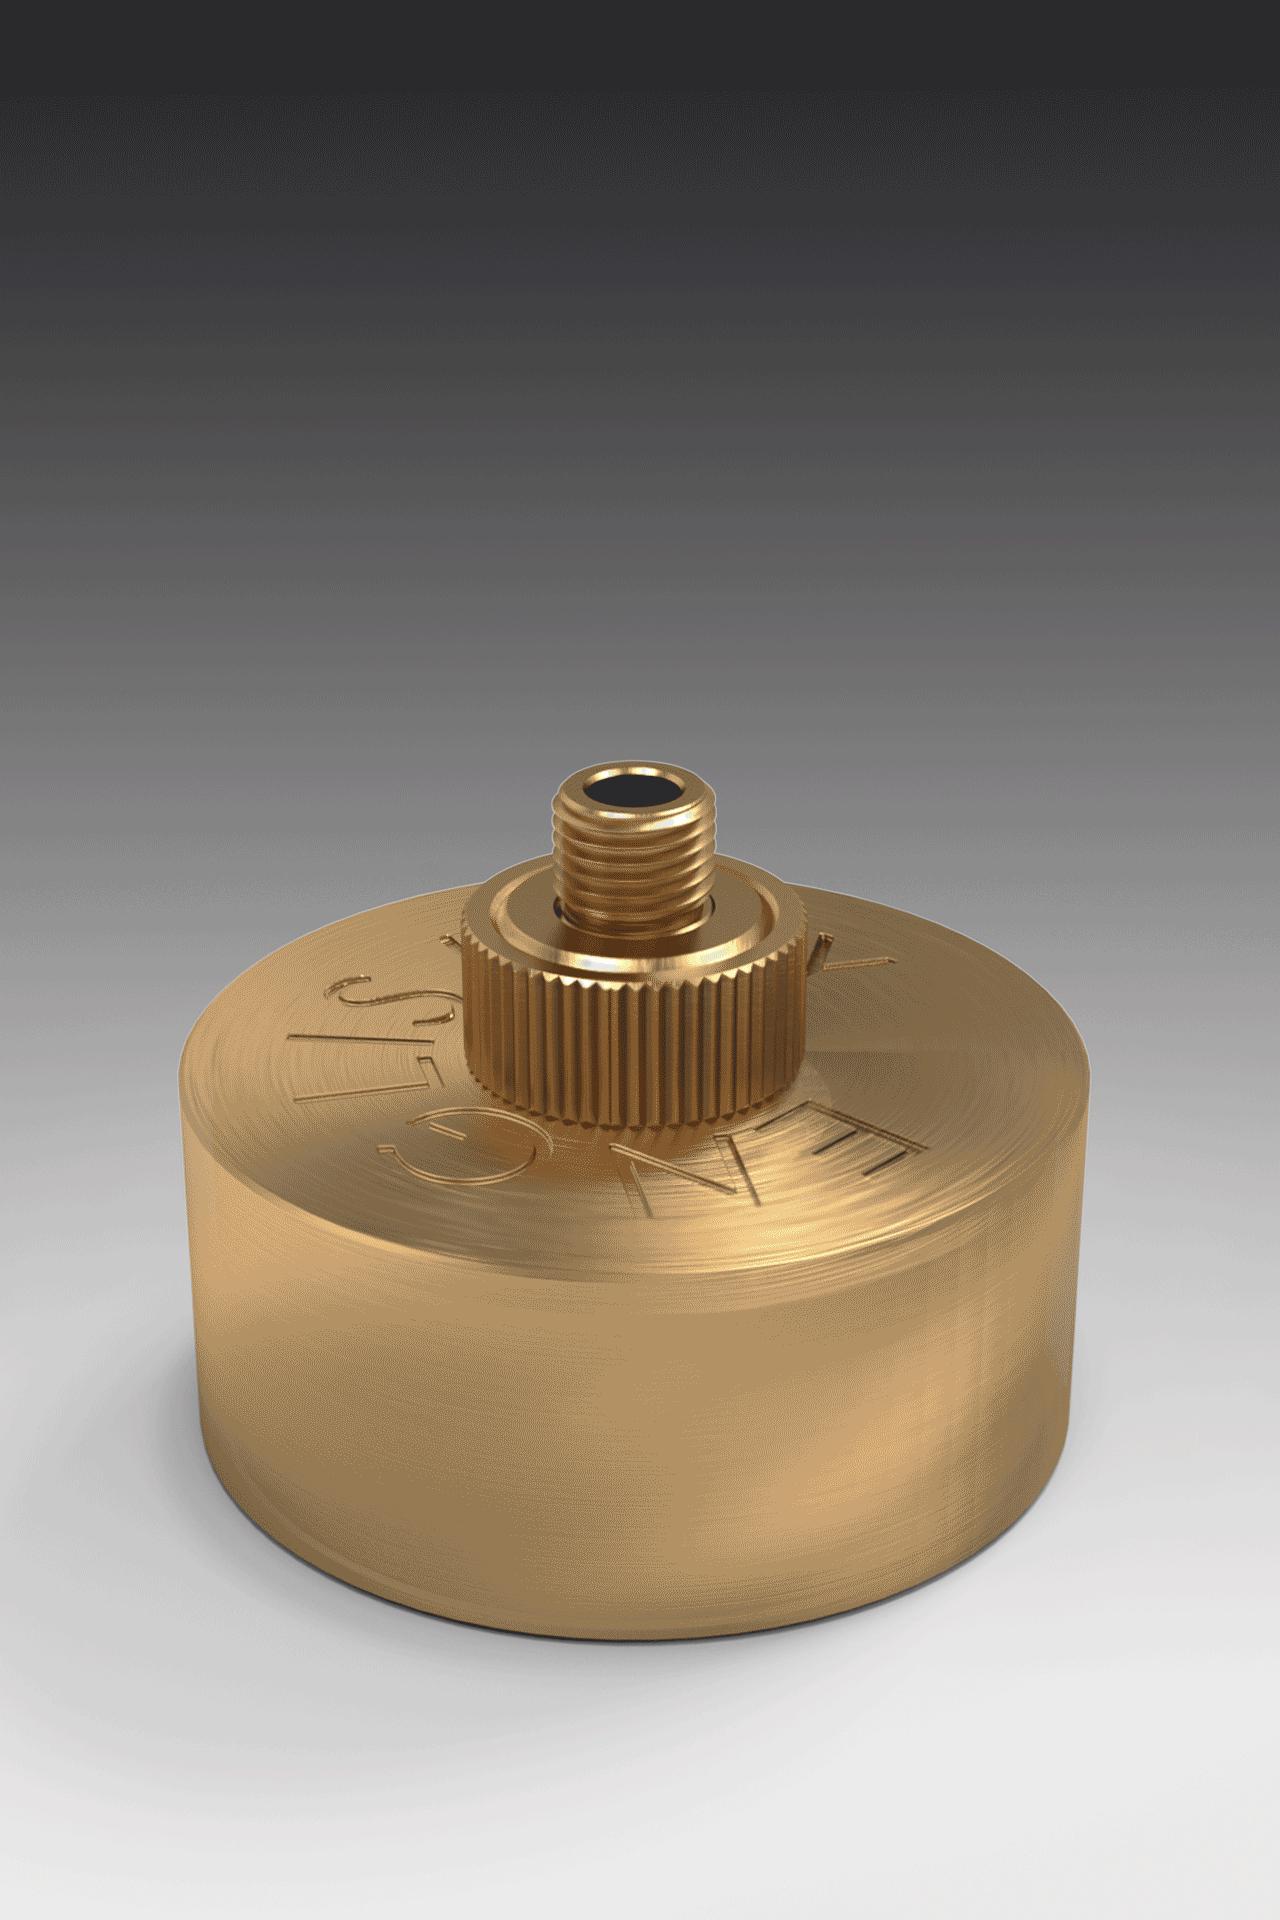 brass box on grey background